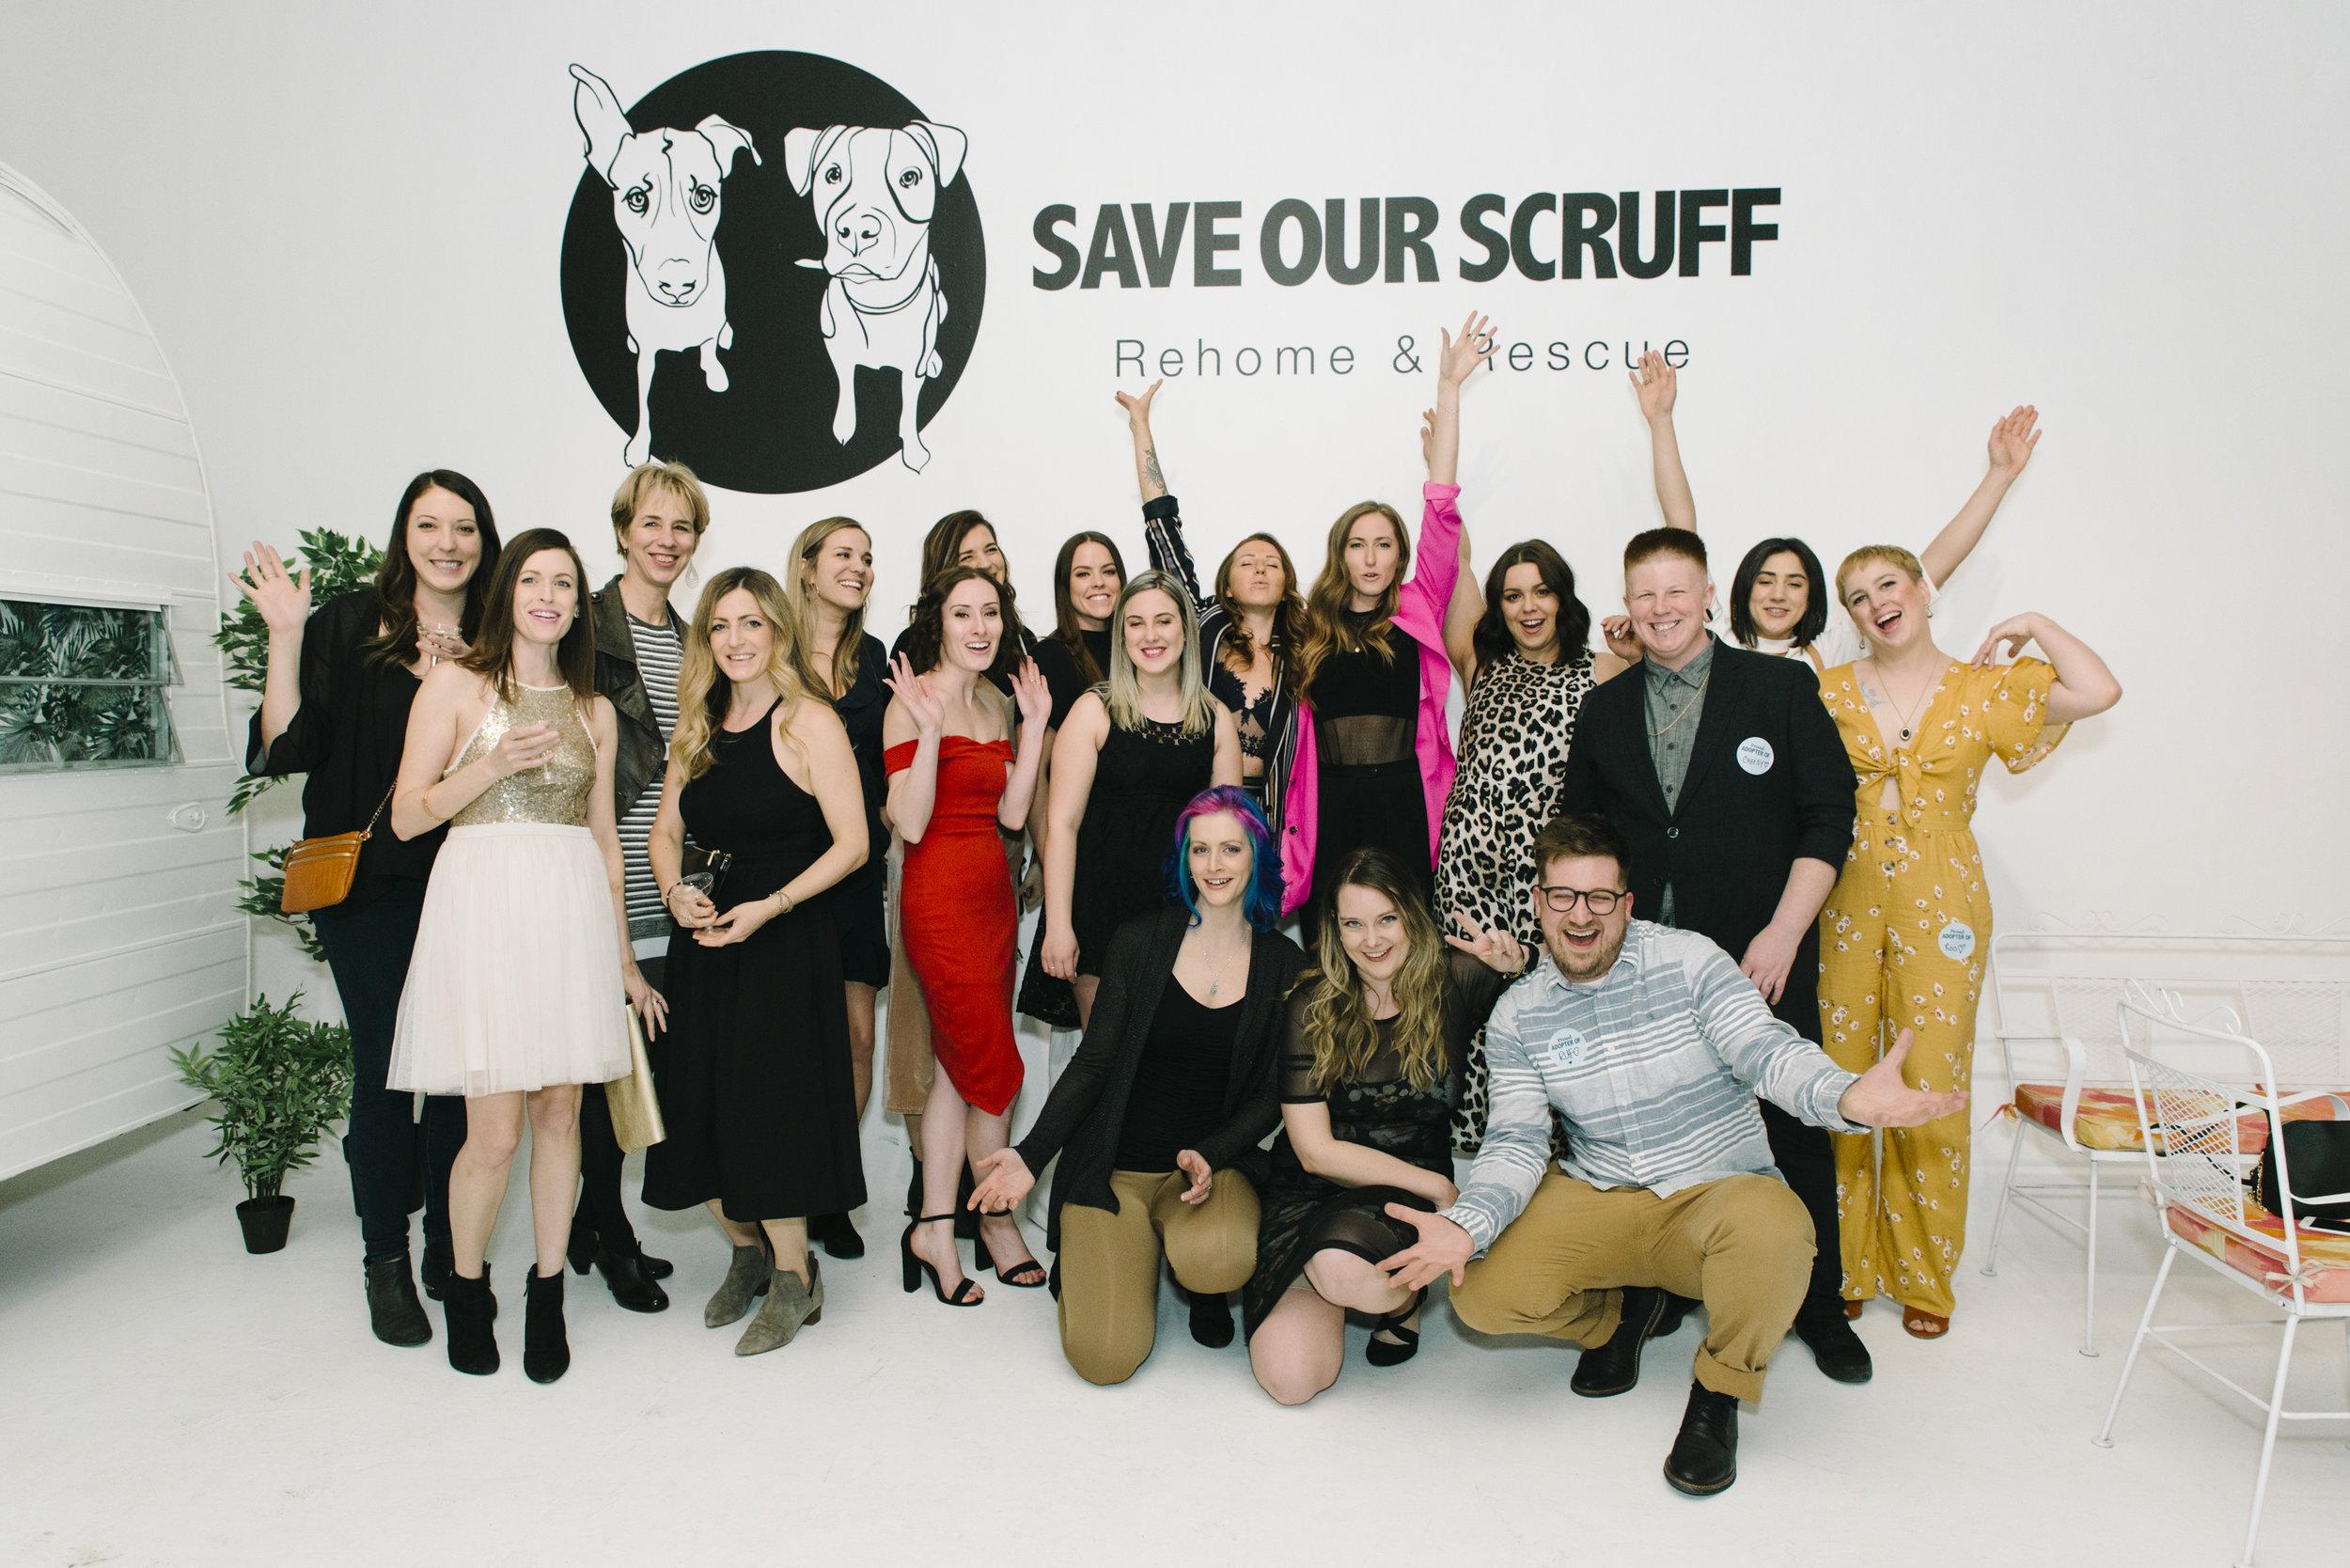 StefEthan-SaveOurScruff-ScruffSocal-SOS-DogRescue-District28Events-D28-TorontoEventPhotographer-Event-SOSDogRescue-27.JPG